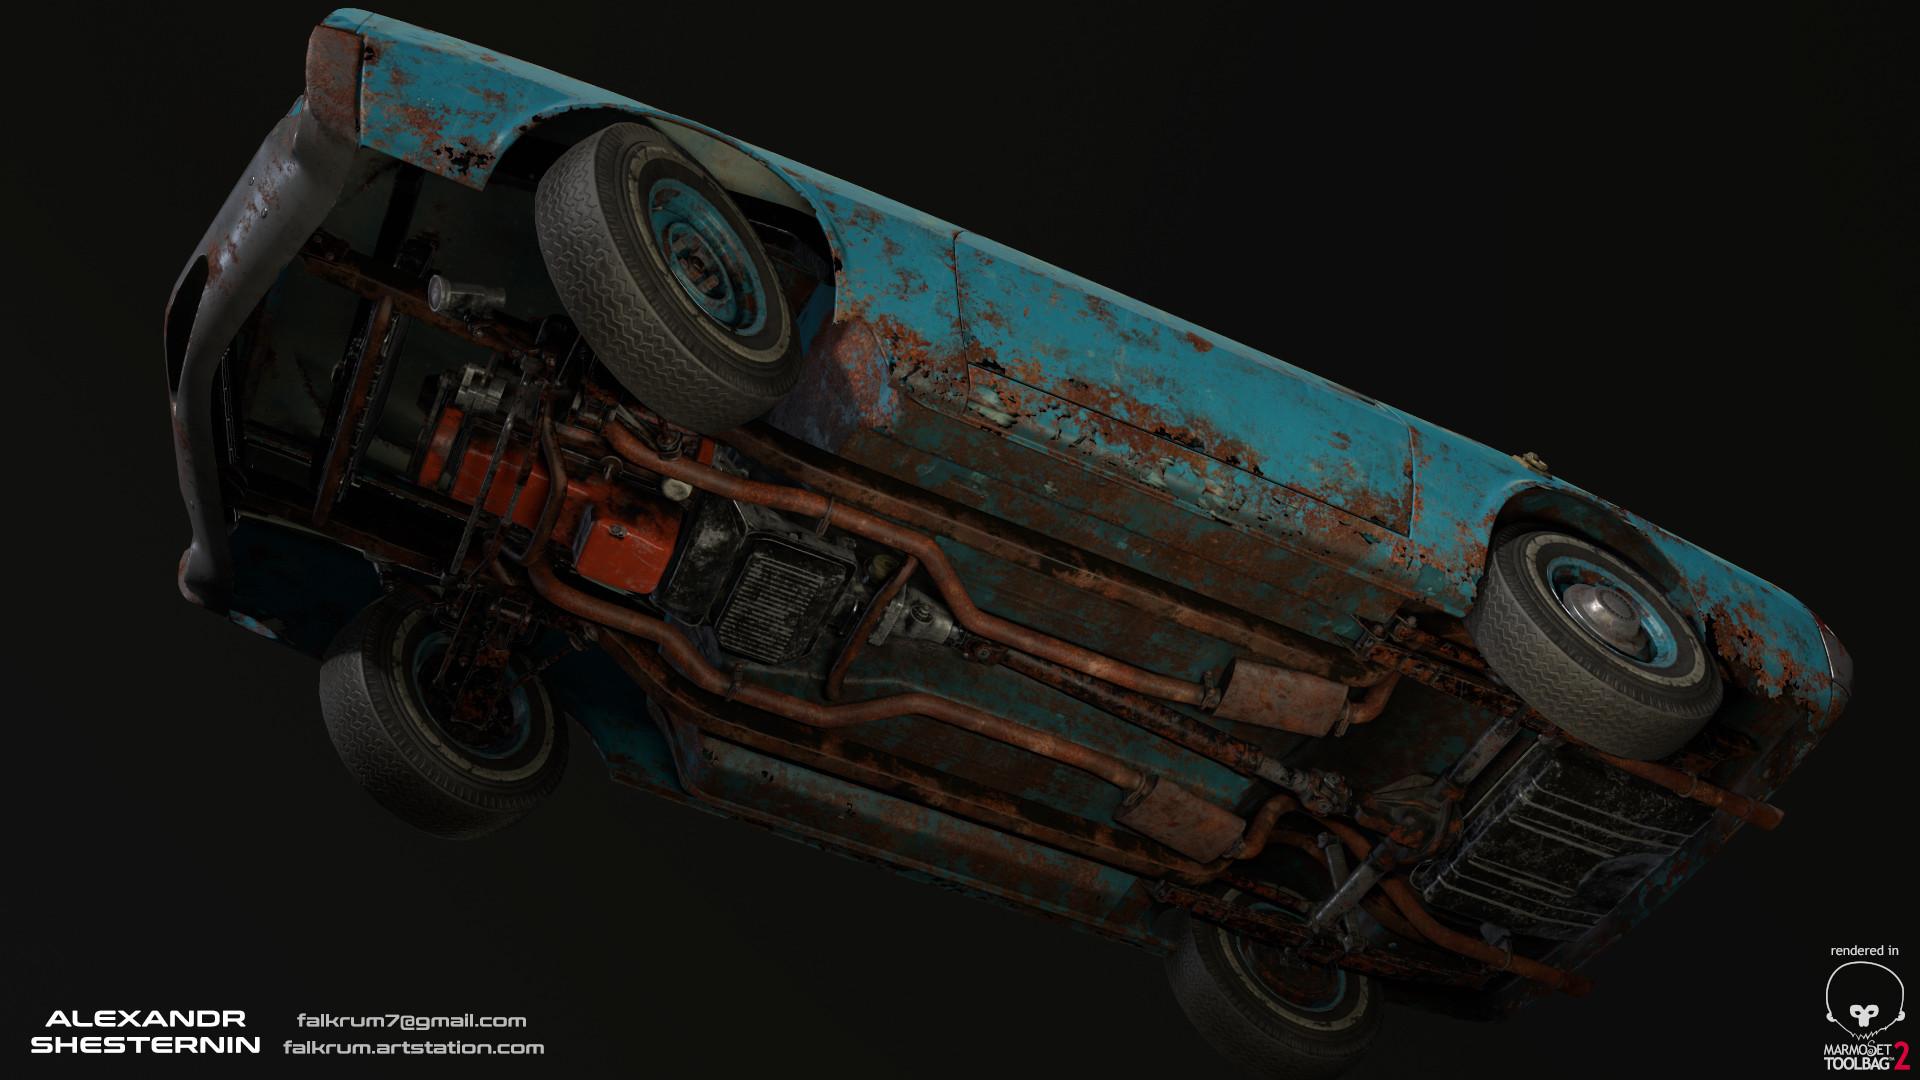 Alexandr shesternin modular abandoned car07